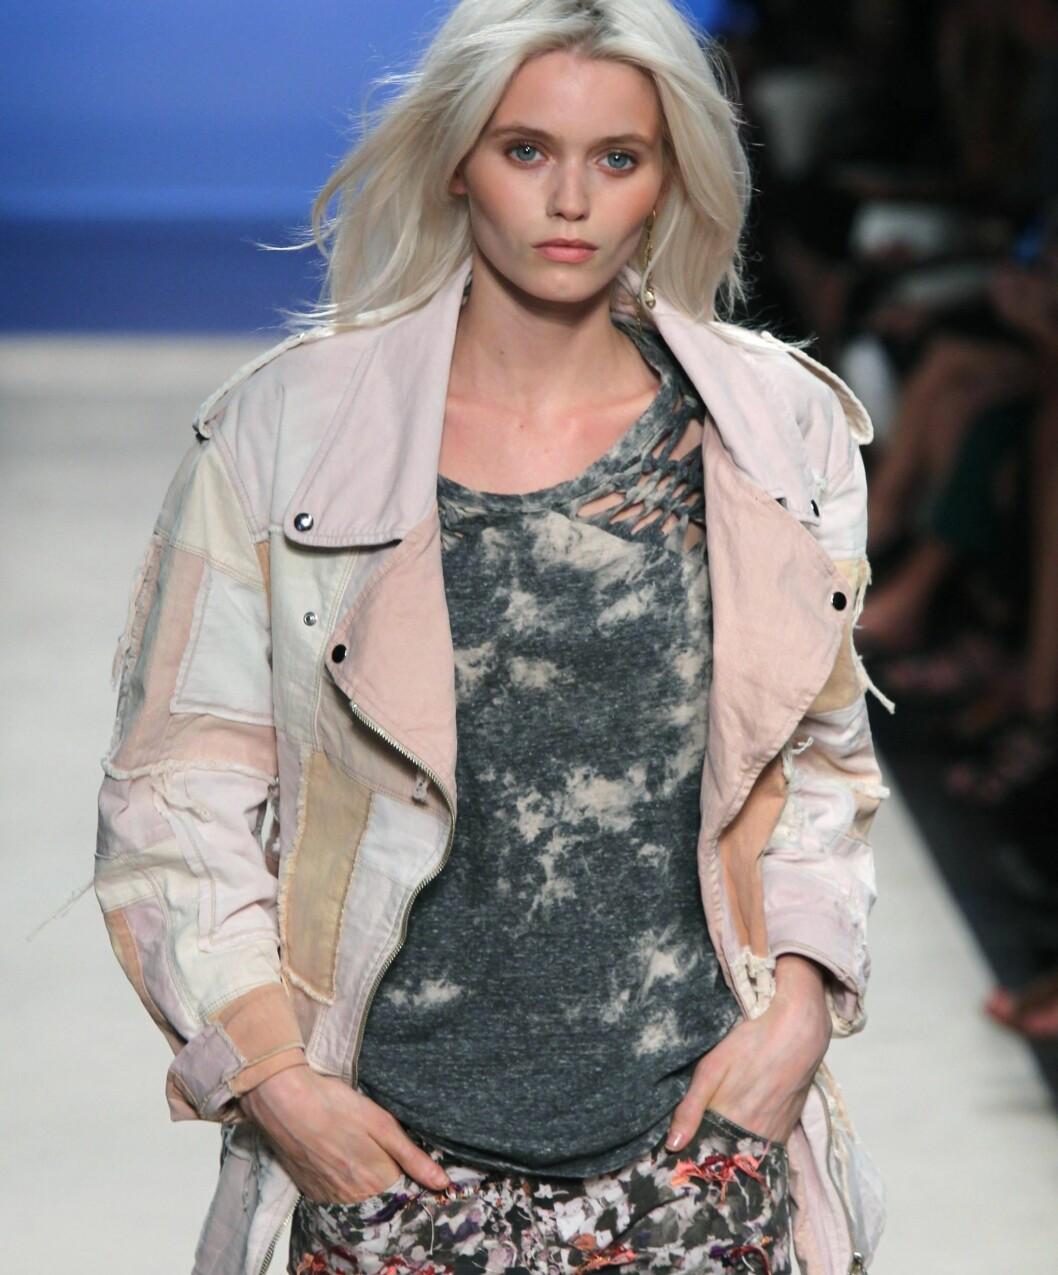 <strong>FREMDELES ROCKA:</strong> Isabel Marant kombinerer lyserosa mc-jakke med slitte, hullete t-skjorter. Foto: All Over Press